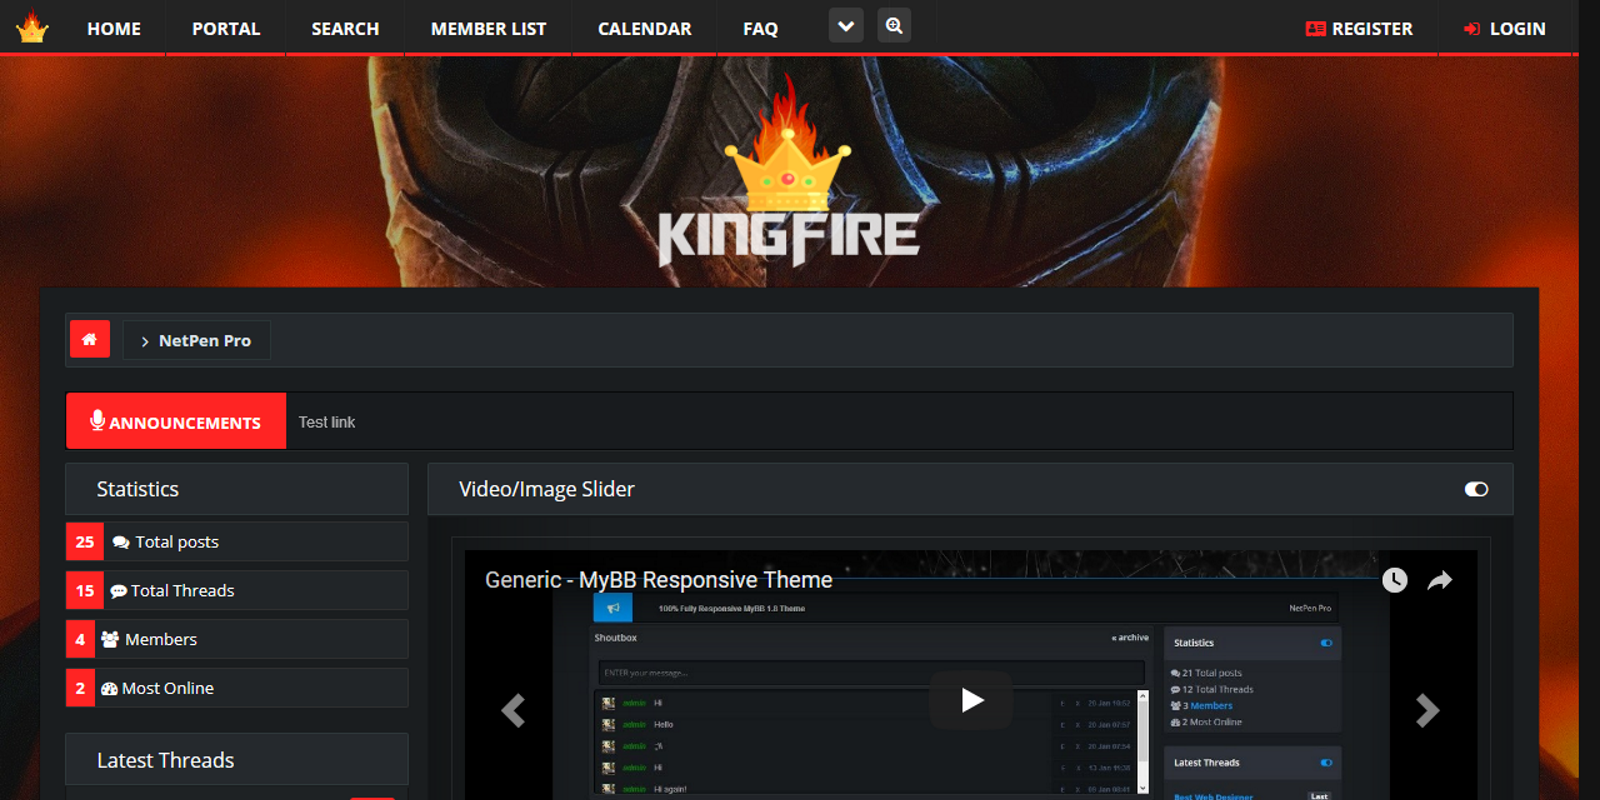 KingFire, Responsive MyBB 1.8 Theme Theme